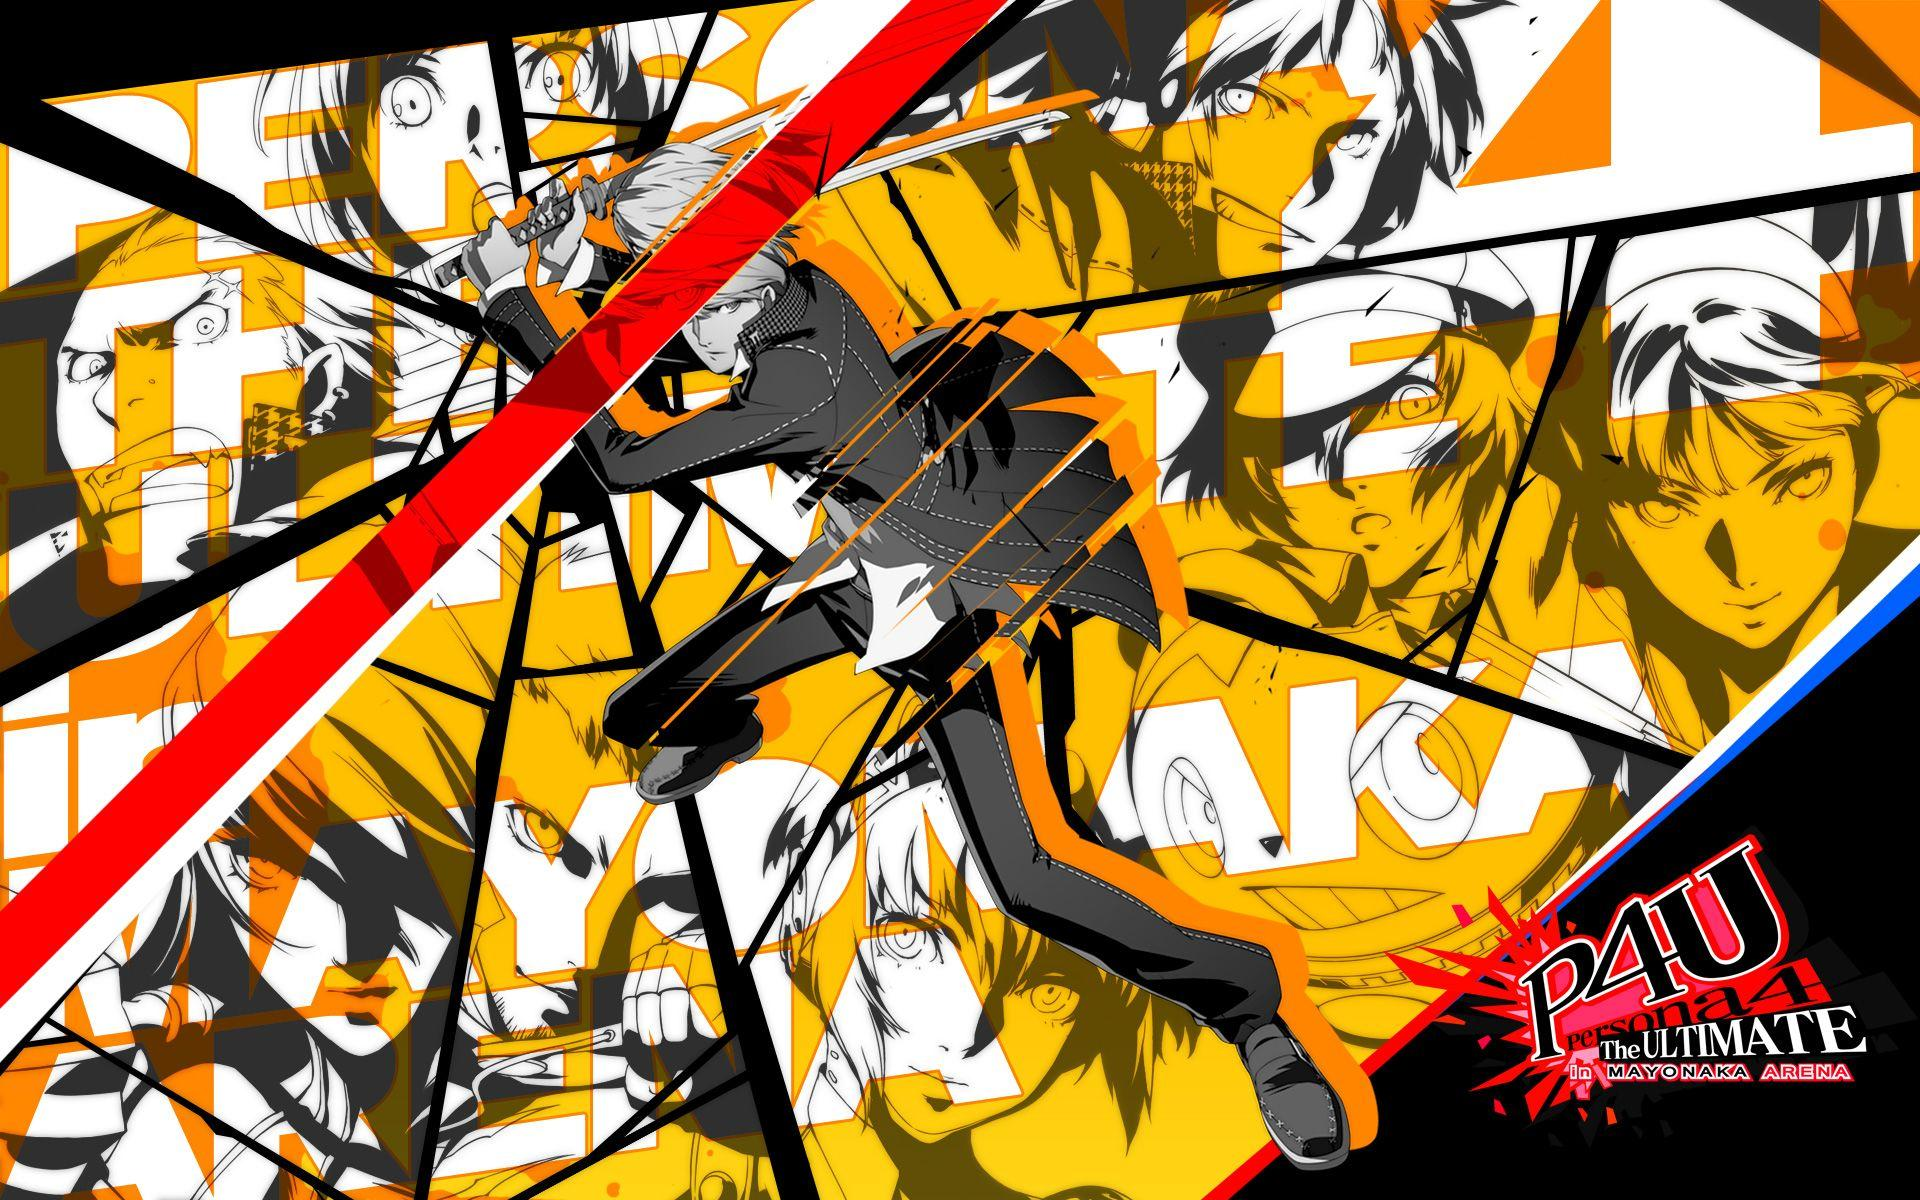 Persona 4 Golden Wallpapers - Wallpaper Cave